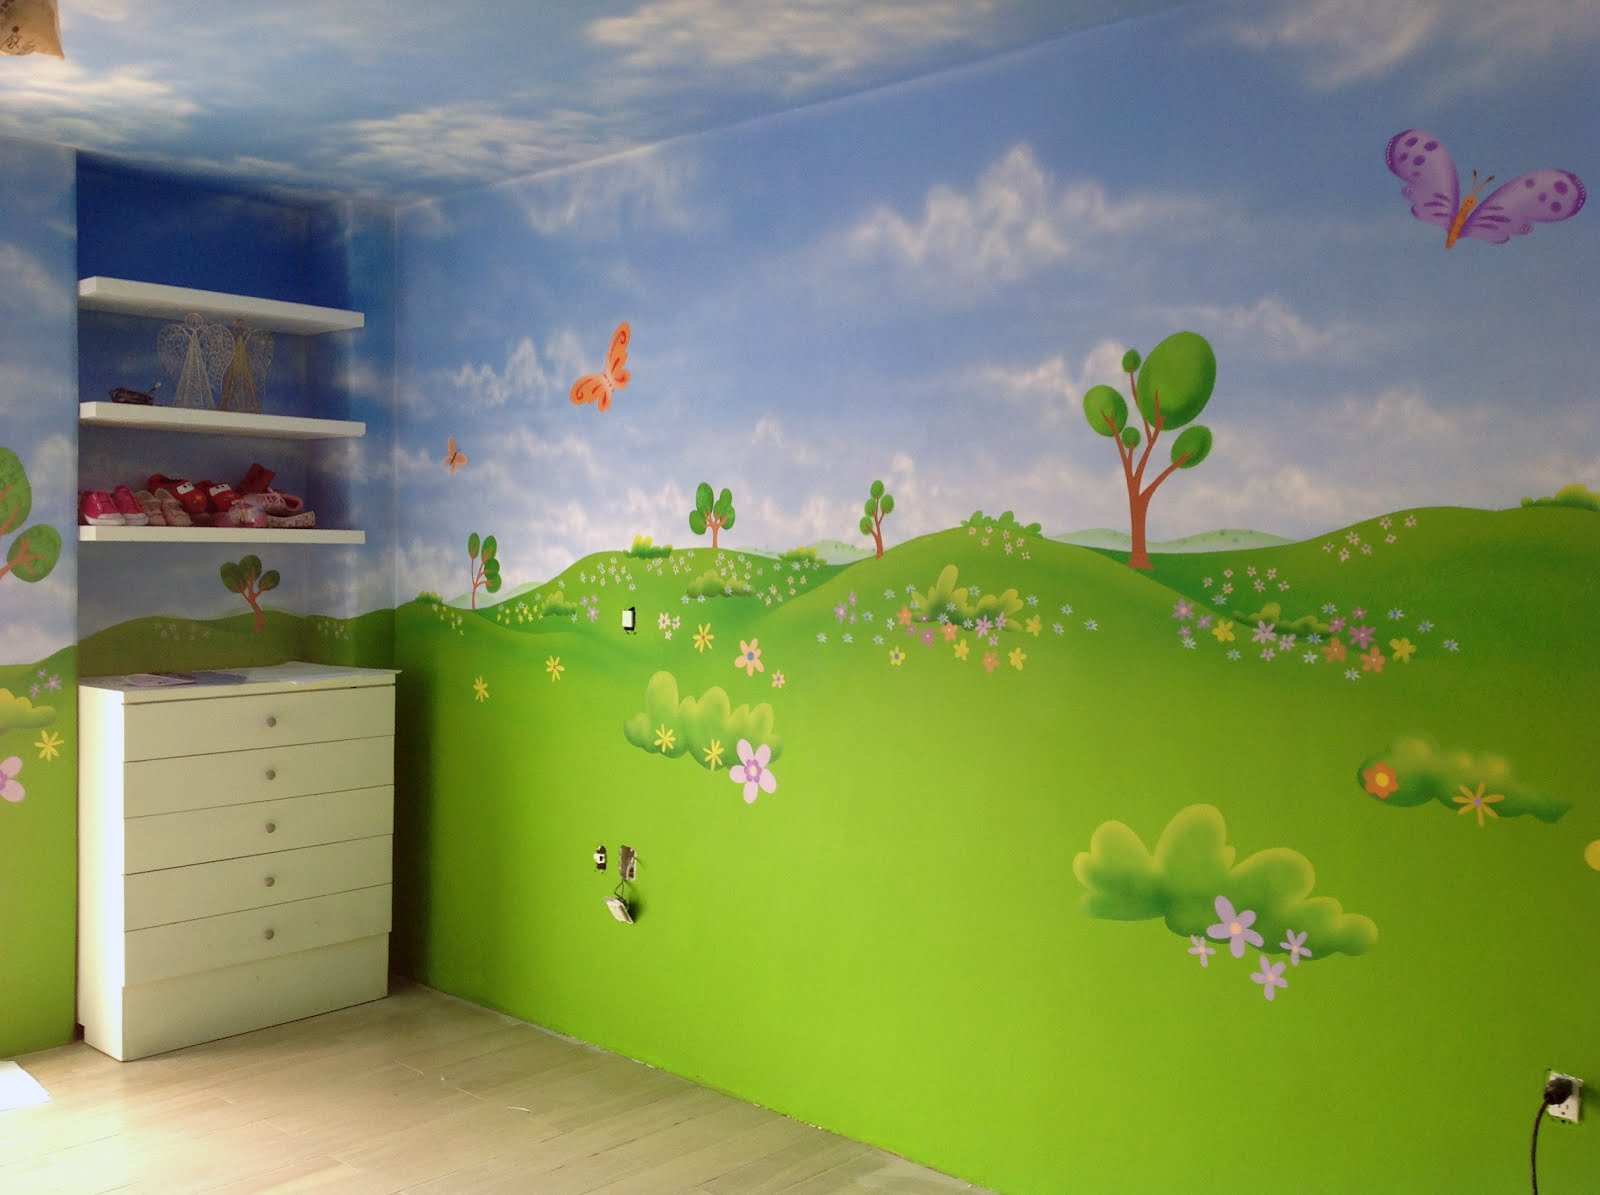 Murales infantiles y arte decorativo pintado a mano por un for Recamaras infantiles queretaro